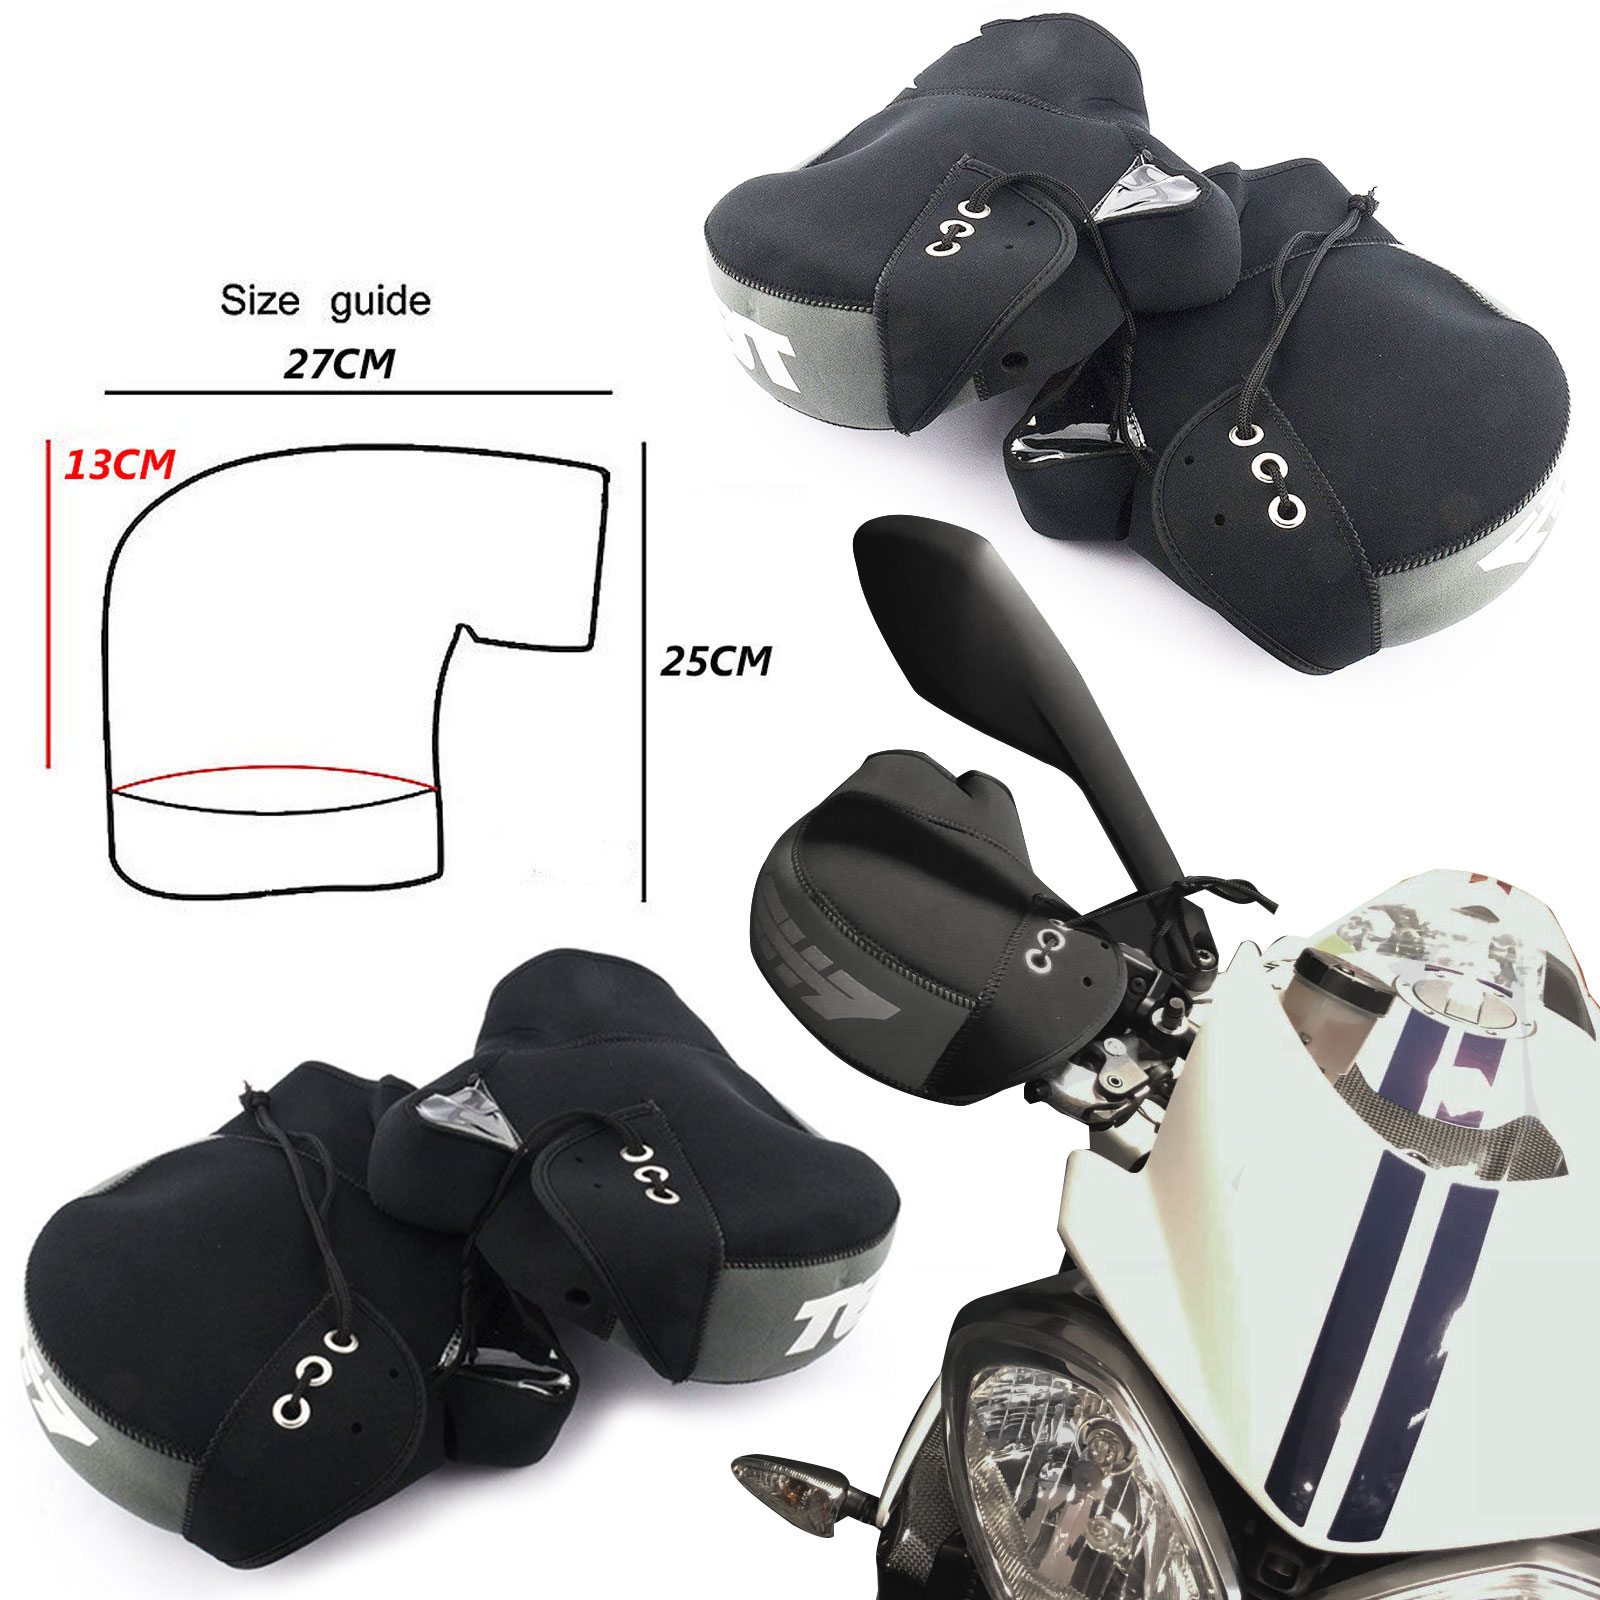 Bike It Motorbike Motorcycle Boxer Bar Neoprene Muffs Mitts Gloves